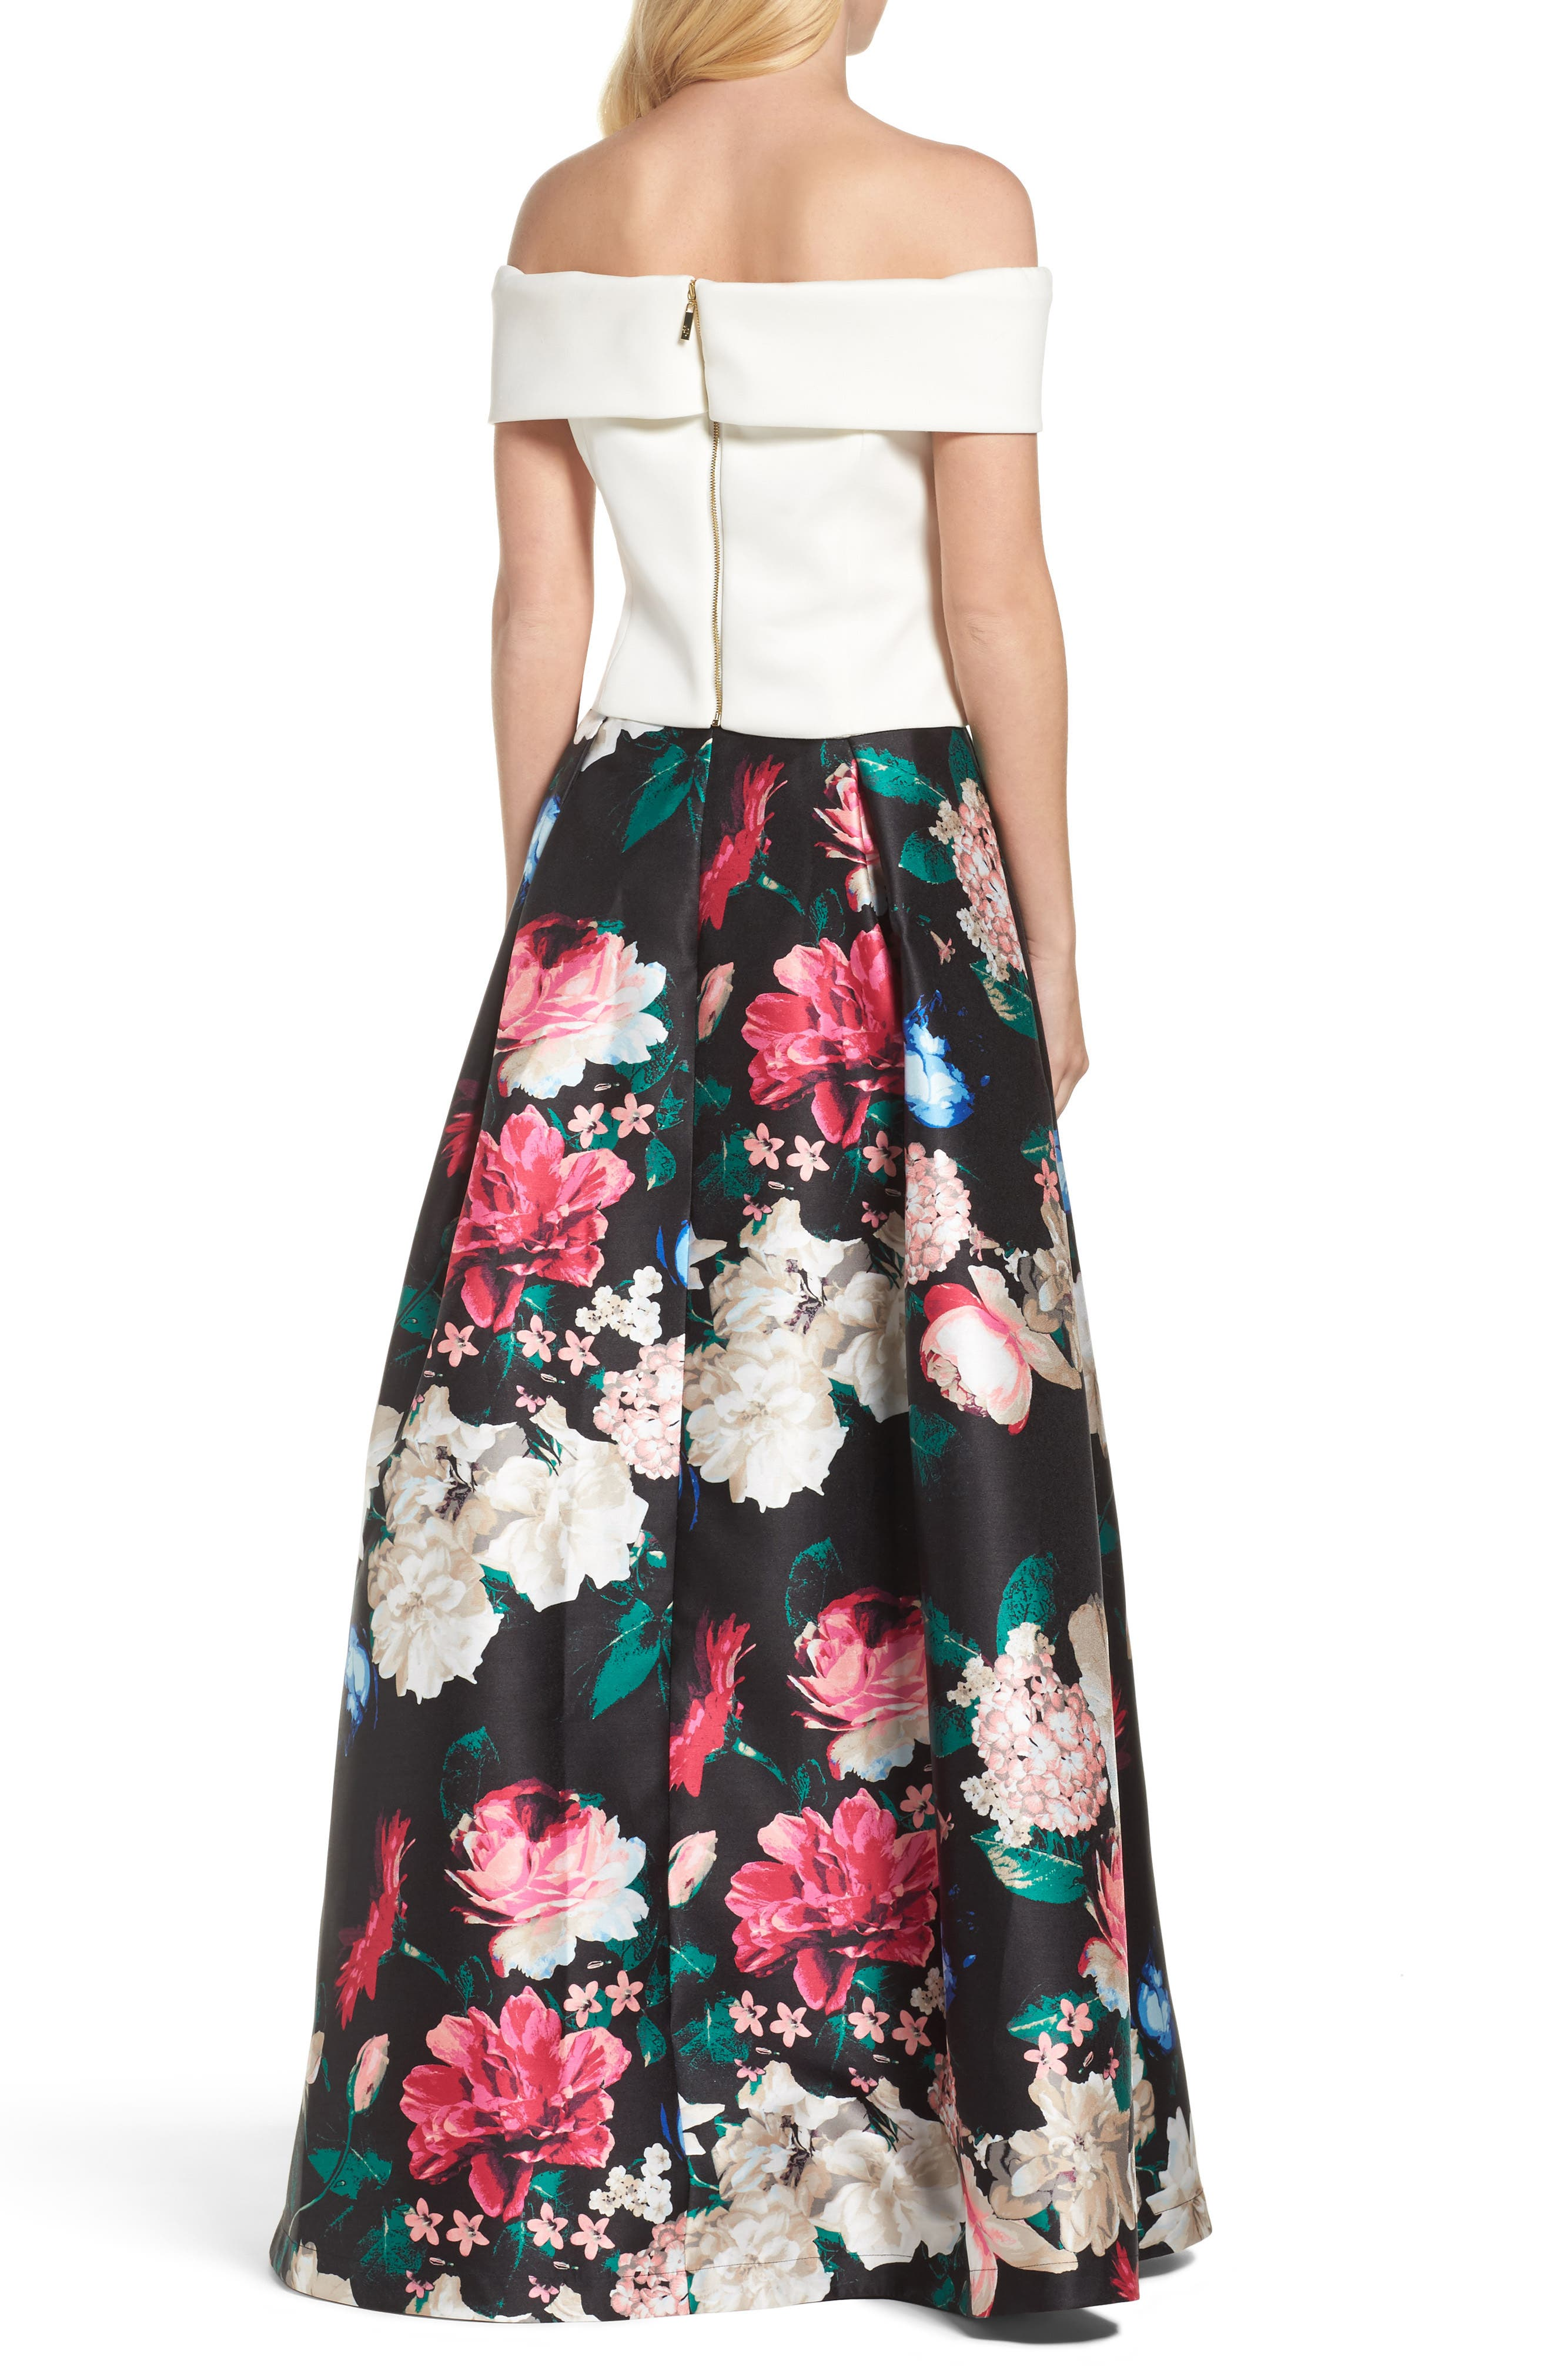 Faille Ball Skirt,                             Alternate thumbnail 7, color,                             006